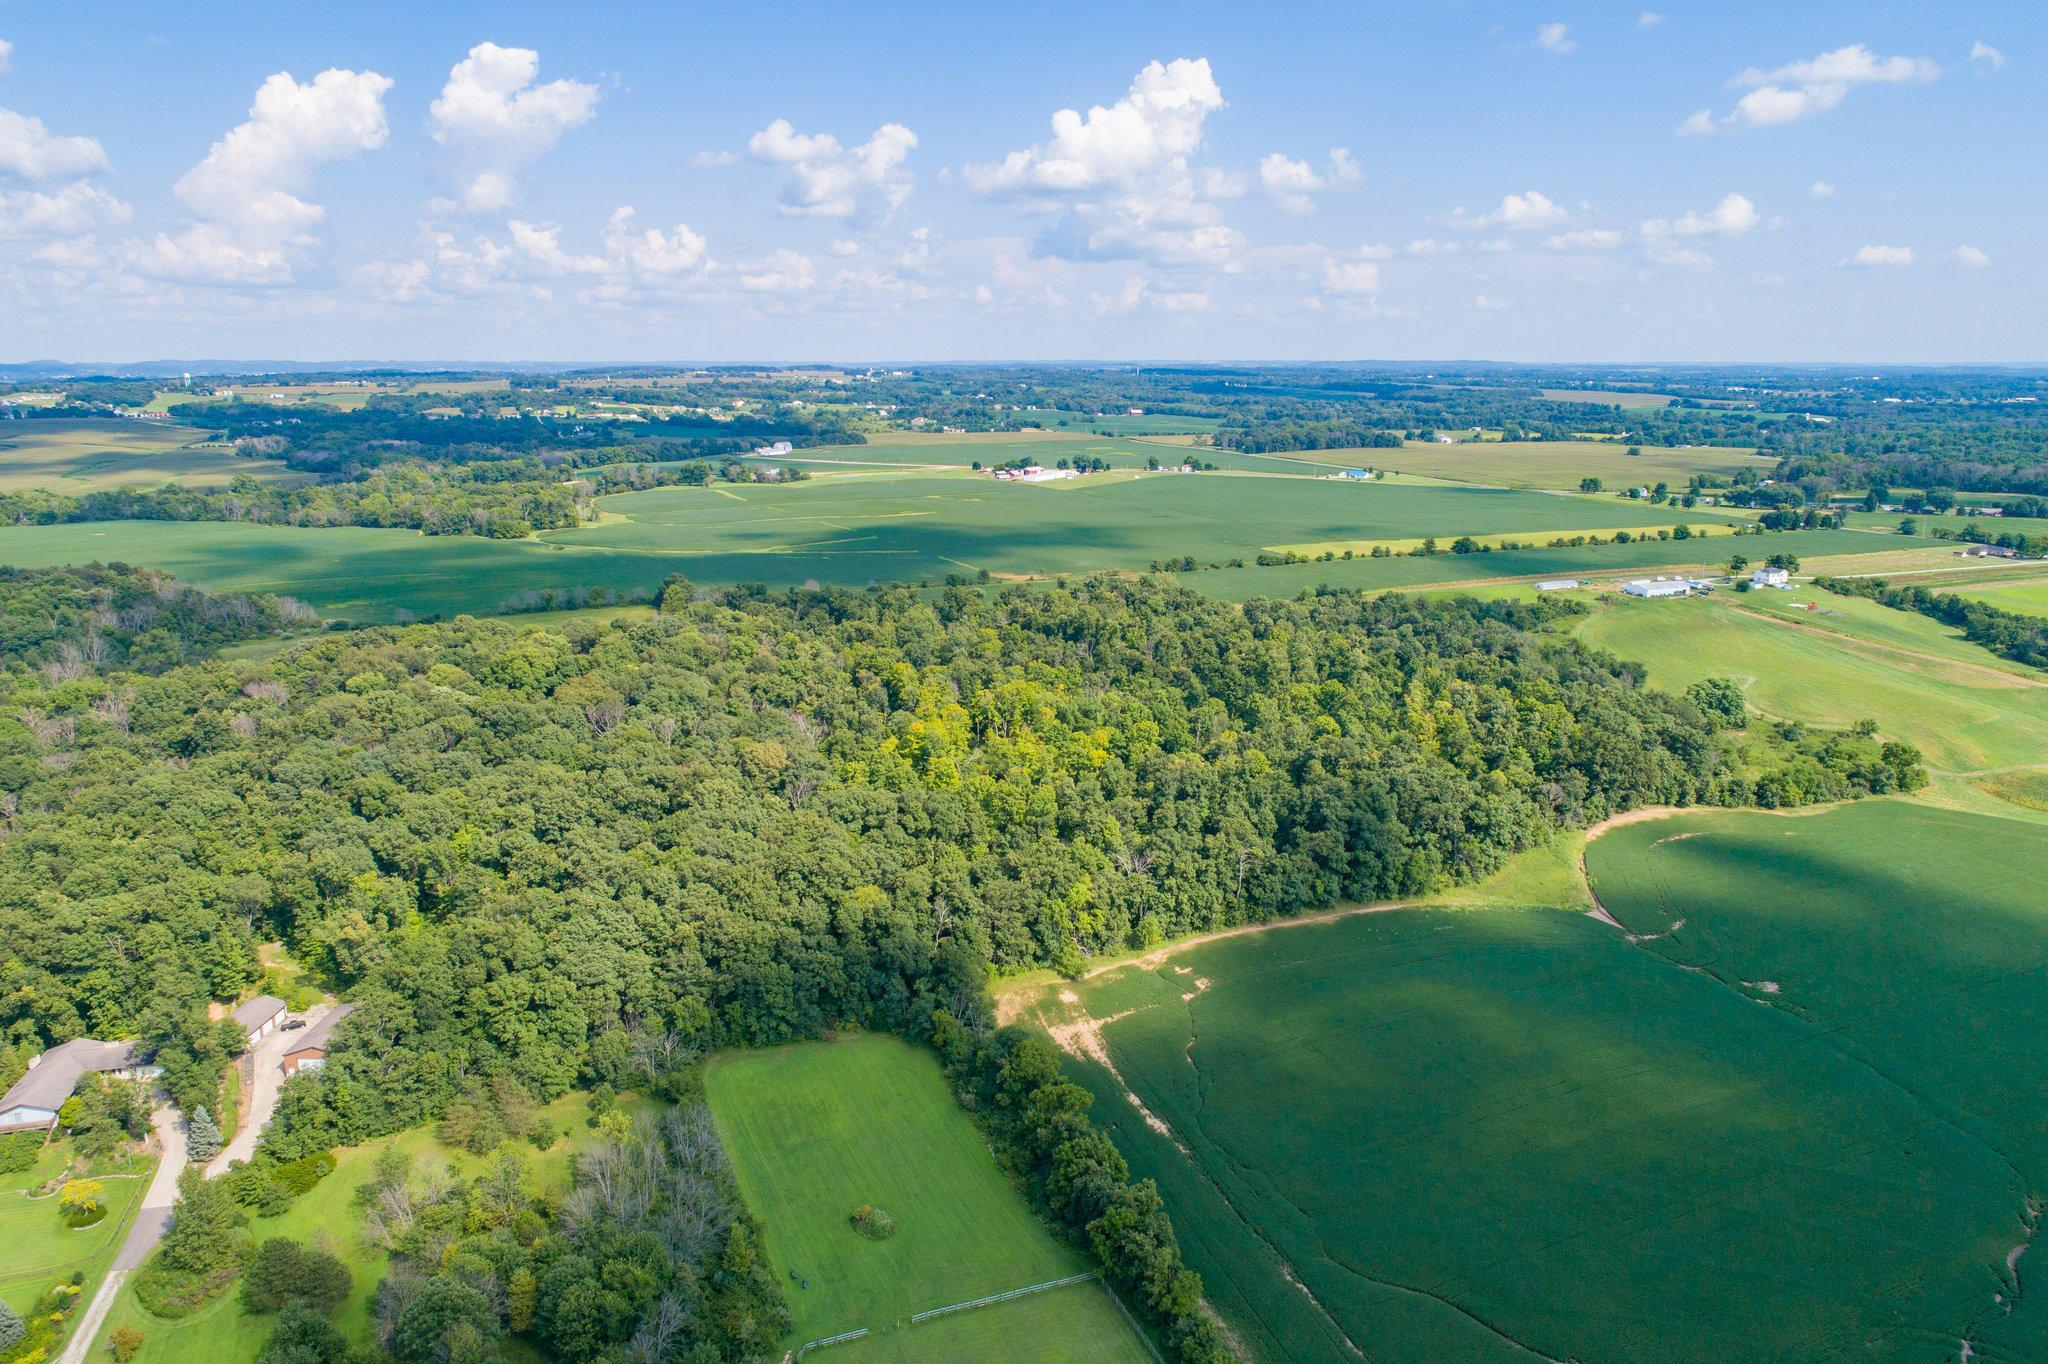 Woods & Farm Land